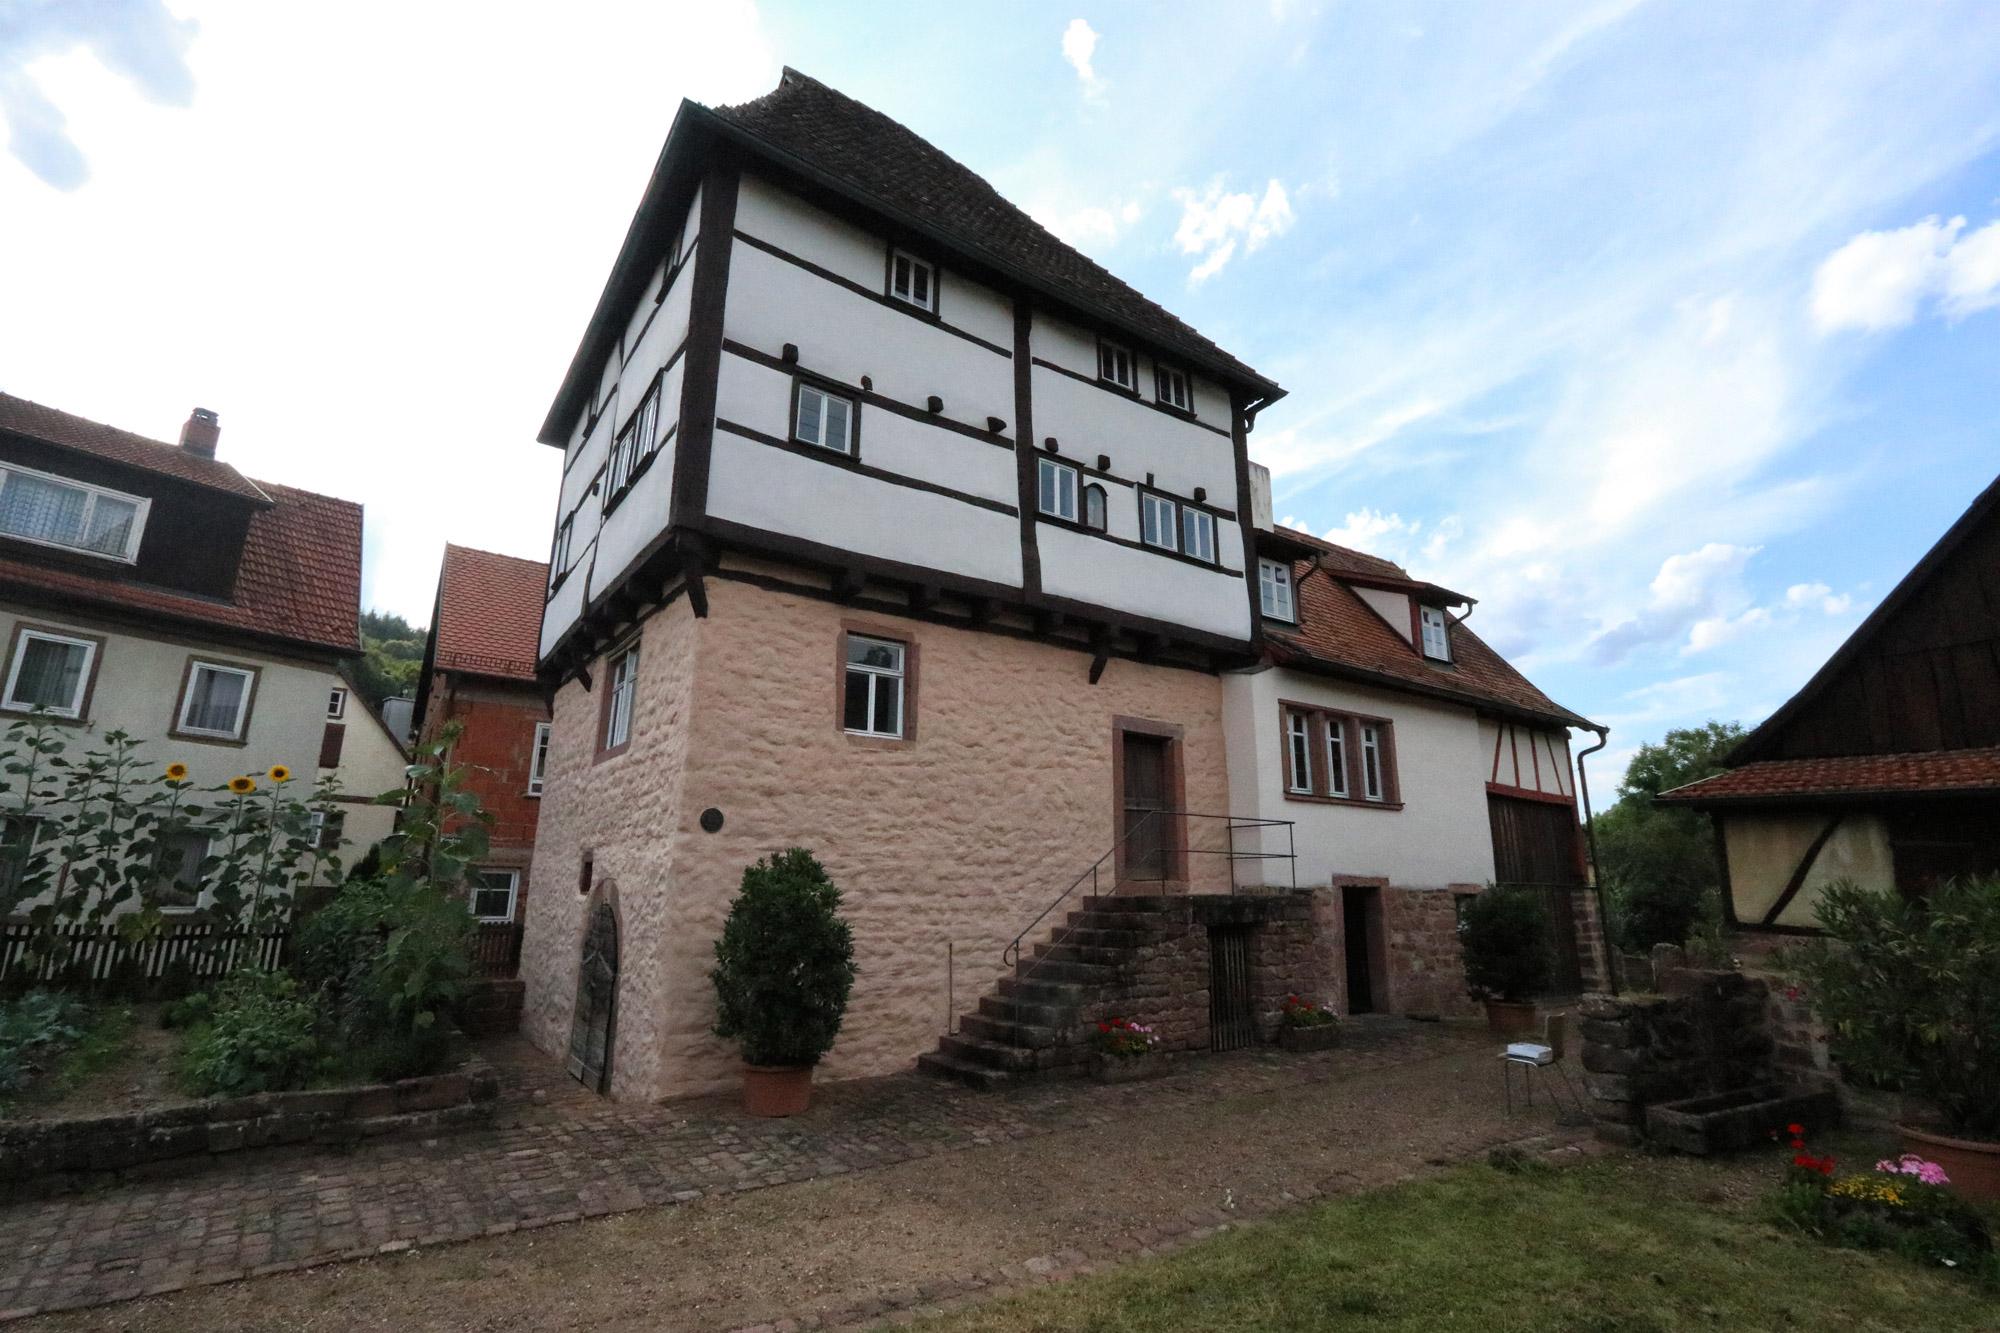 Churfranken - Templerhaus in Amorbach